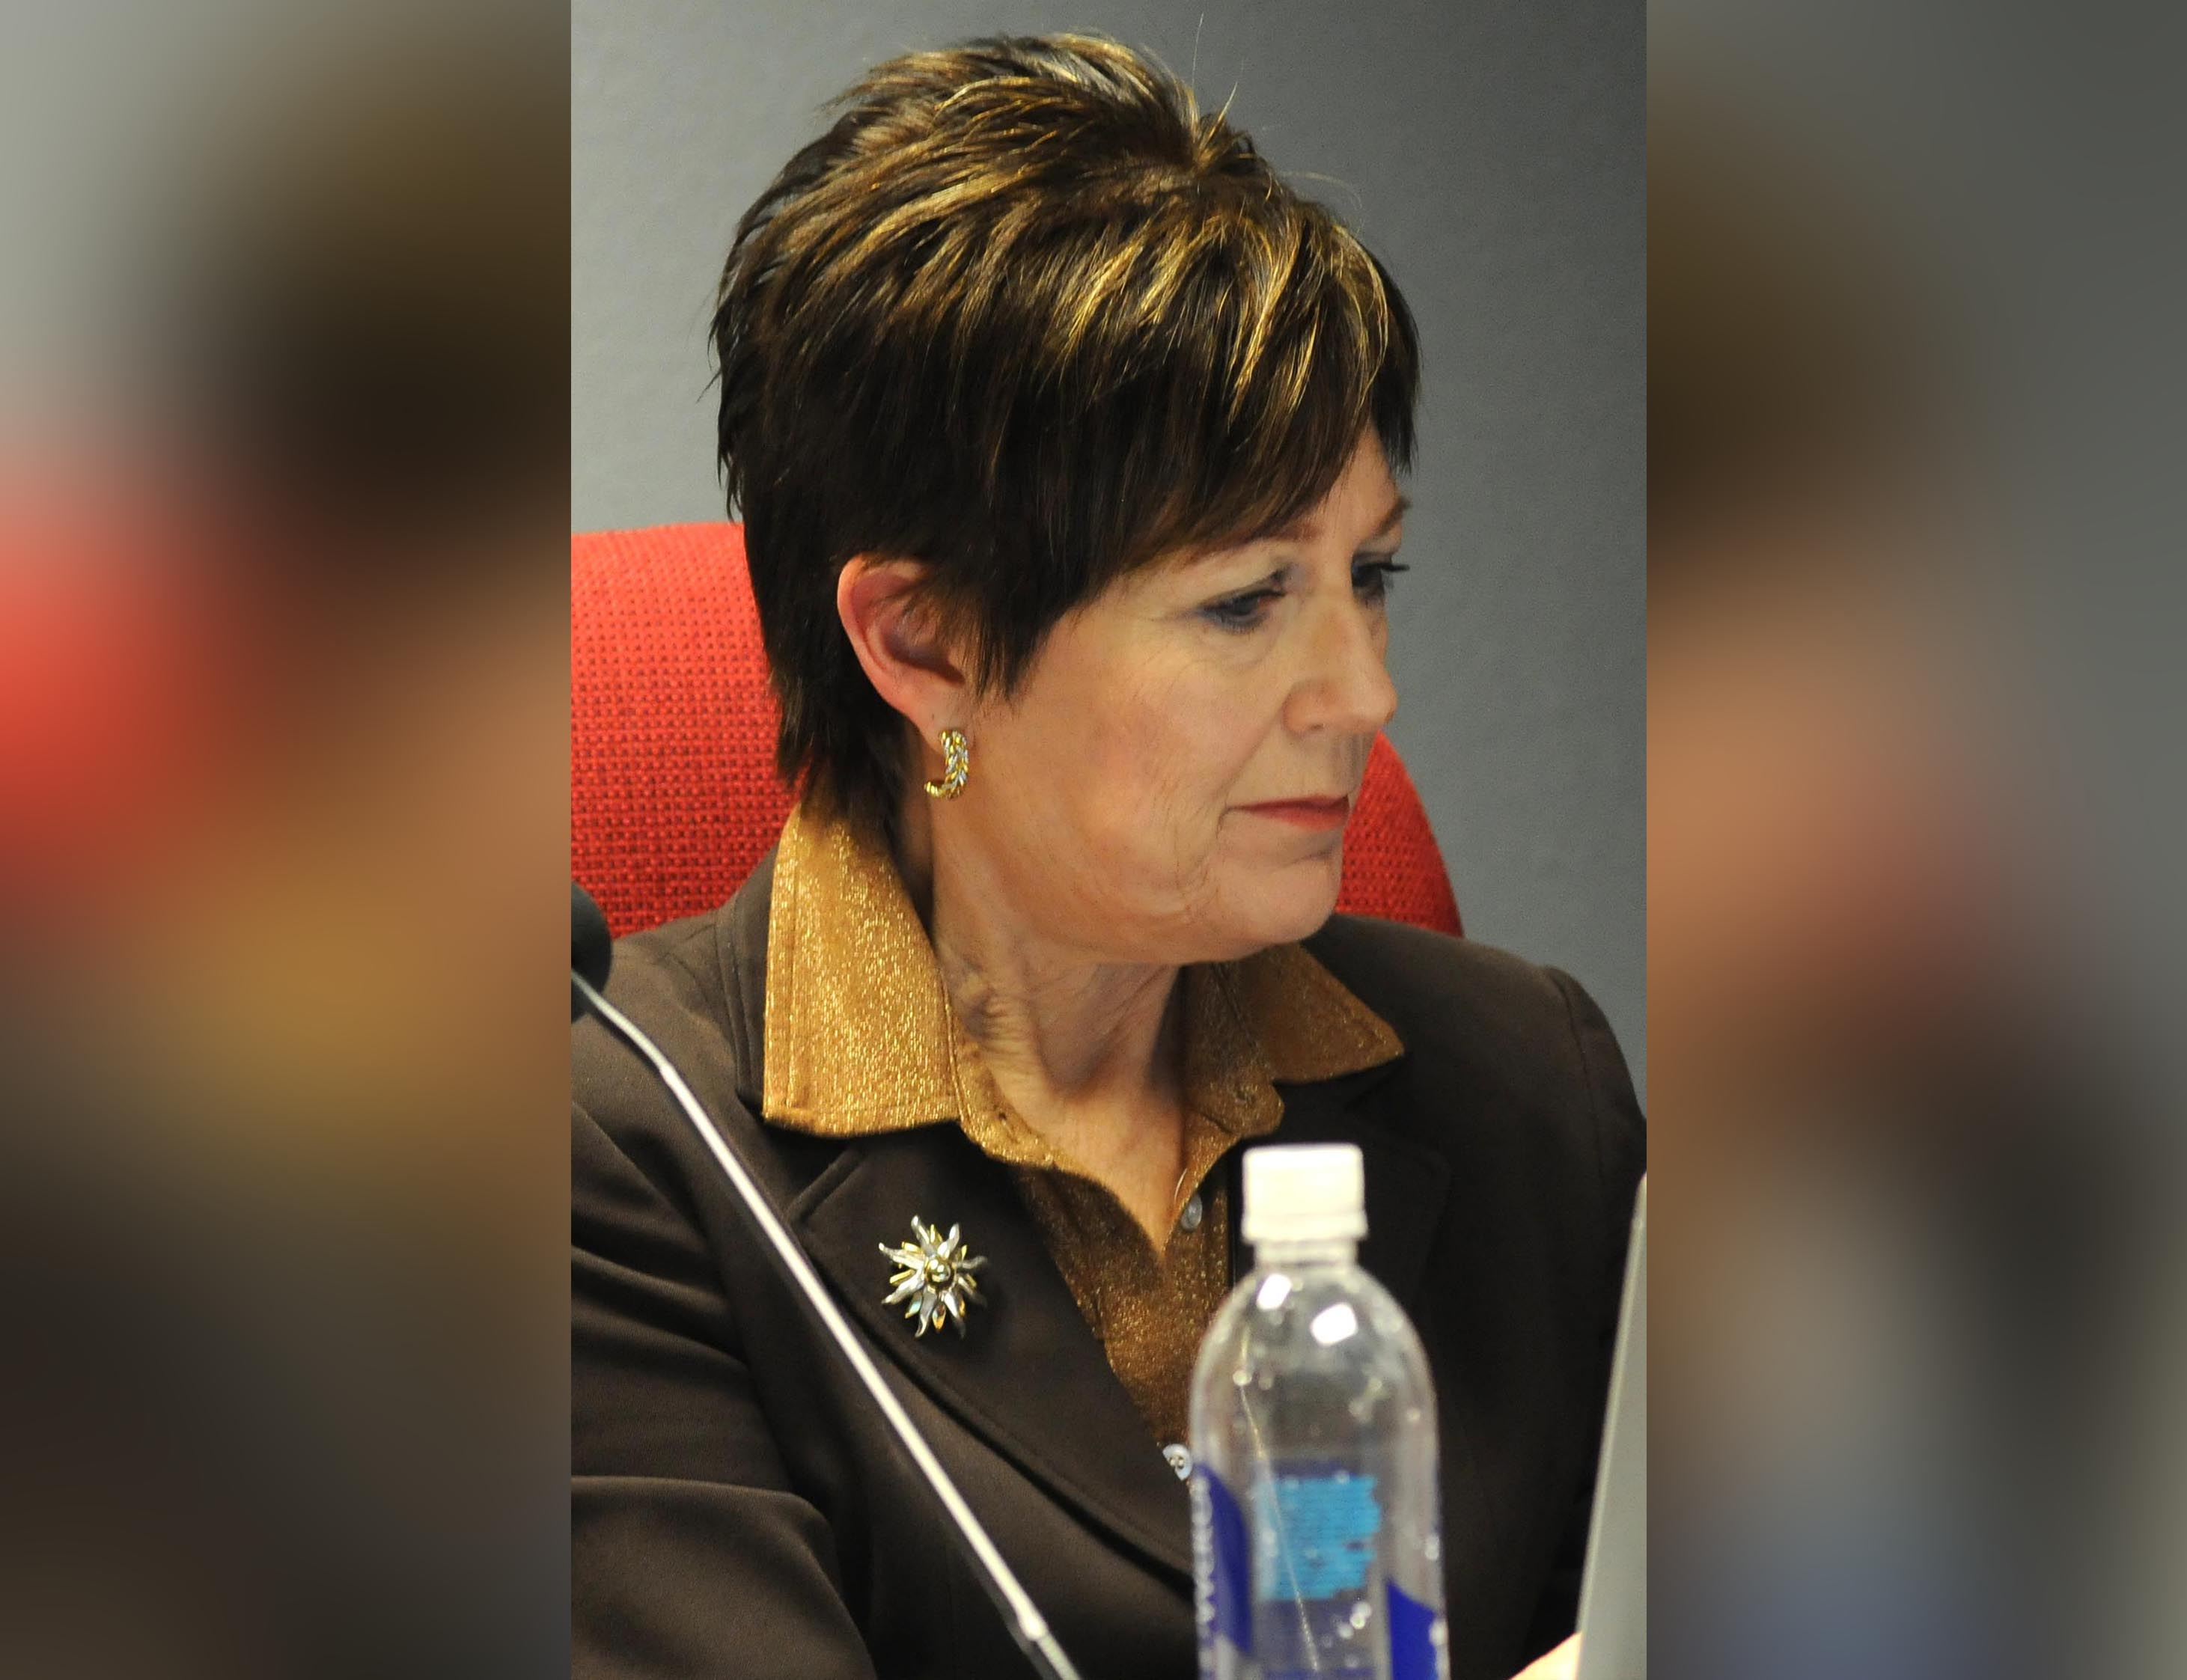 Arizona considers religious exemptions to vaccinations